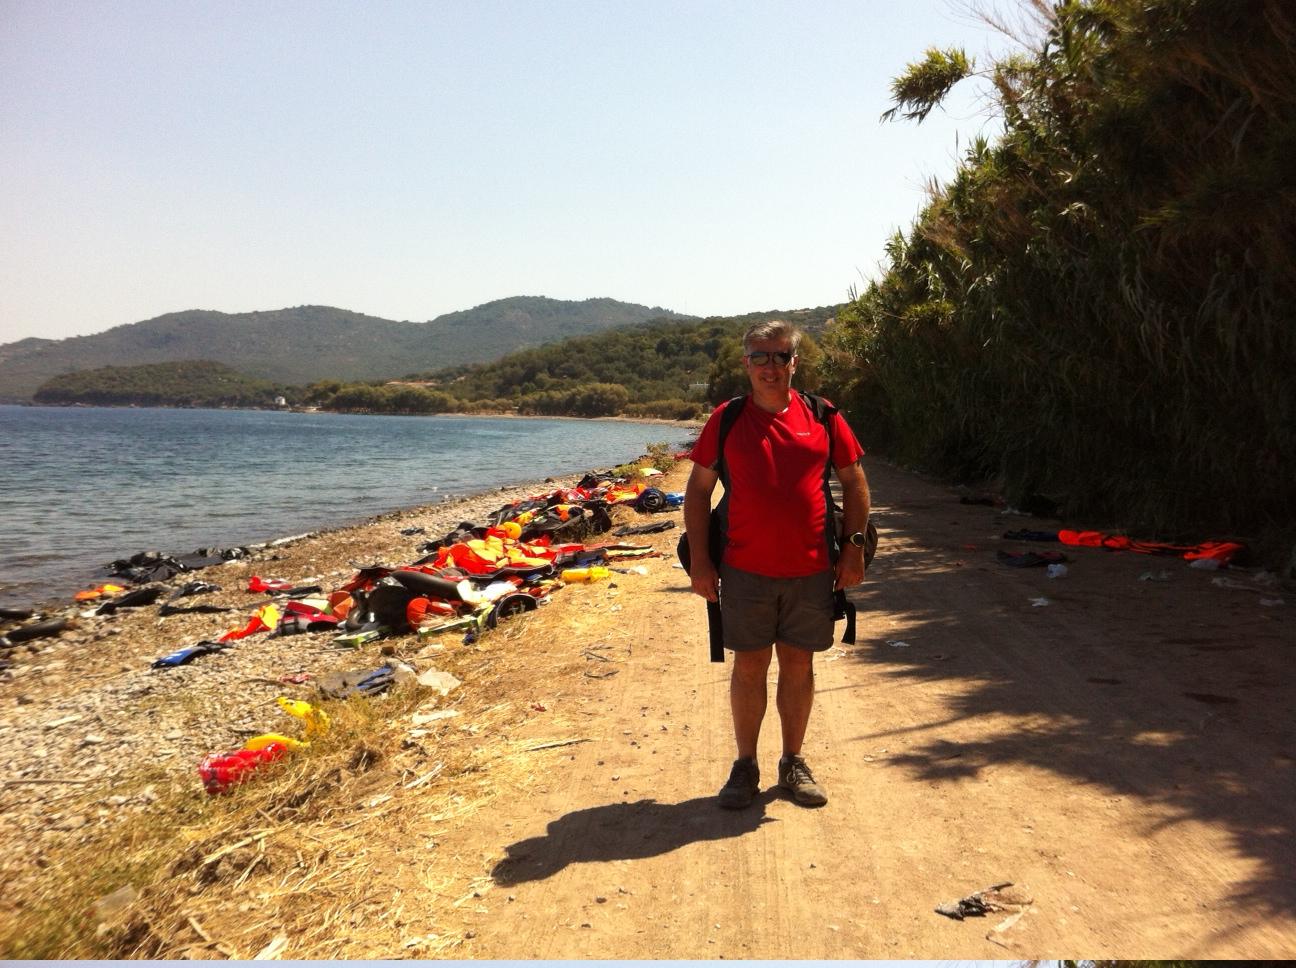 An economic migrant on the coast road - me!